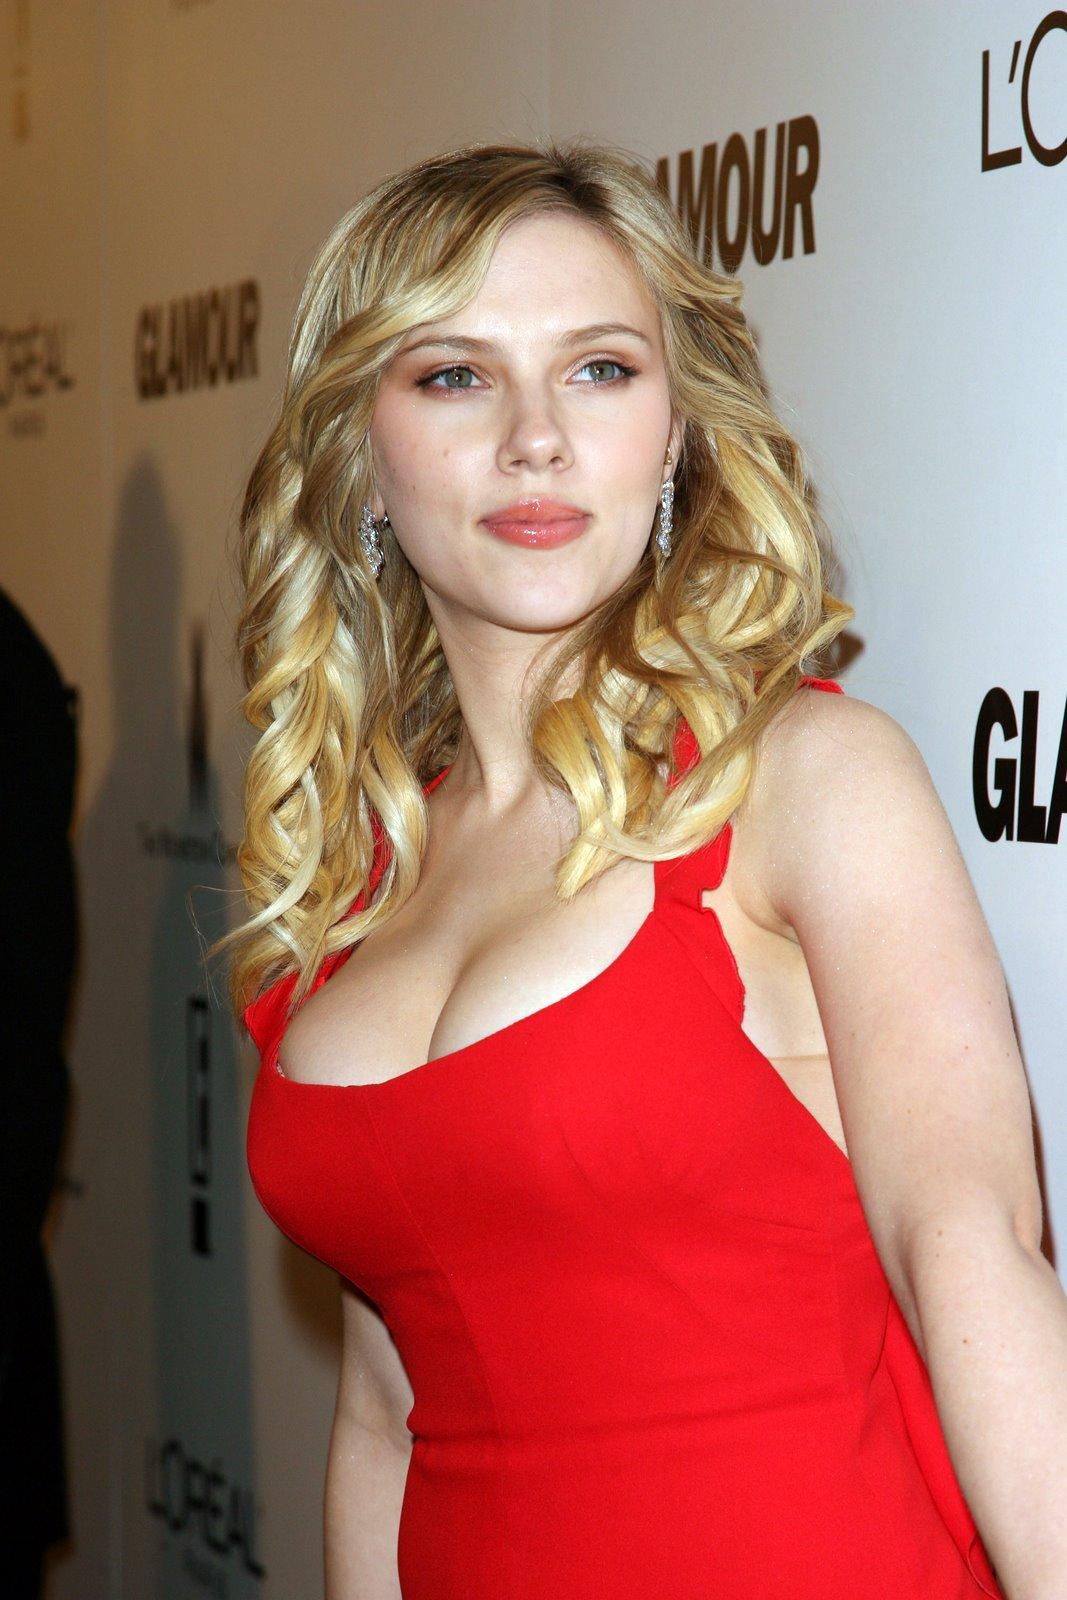 Scarlett Johansson Pic... Scarlett Johansson Herpes